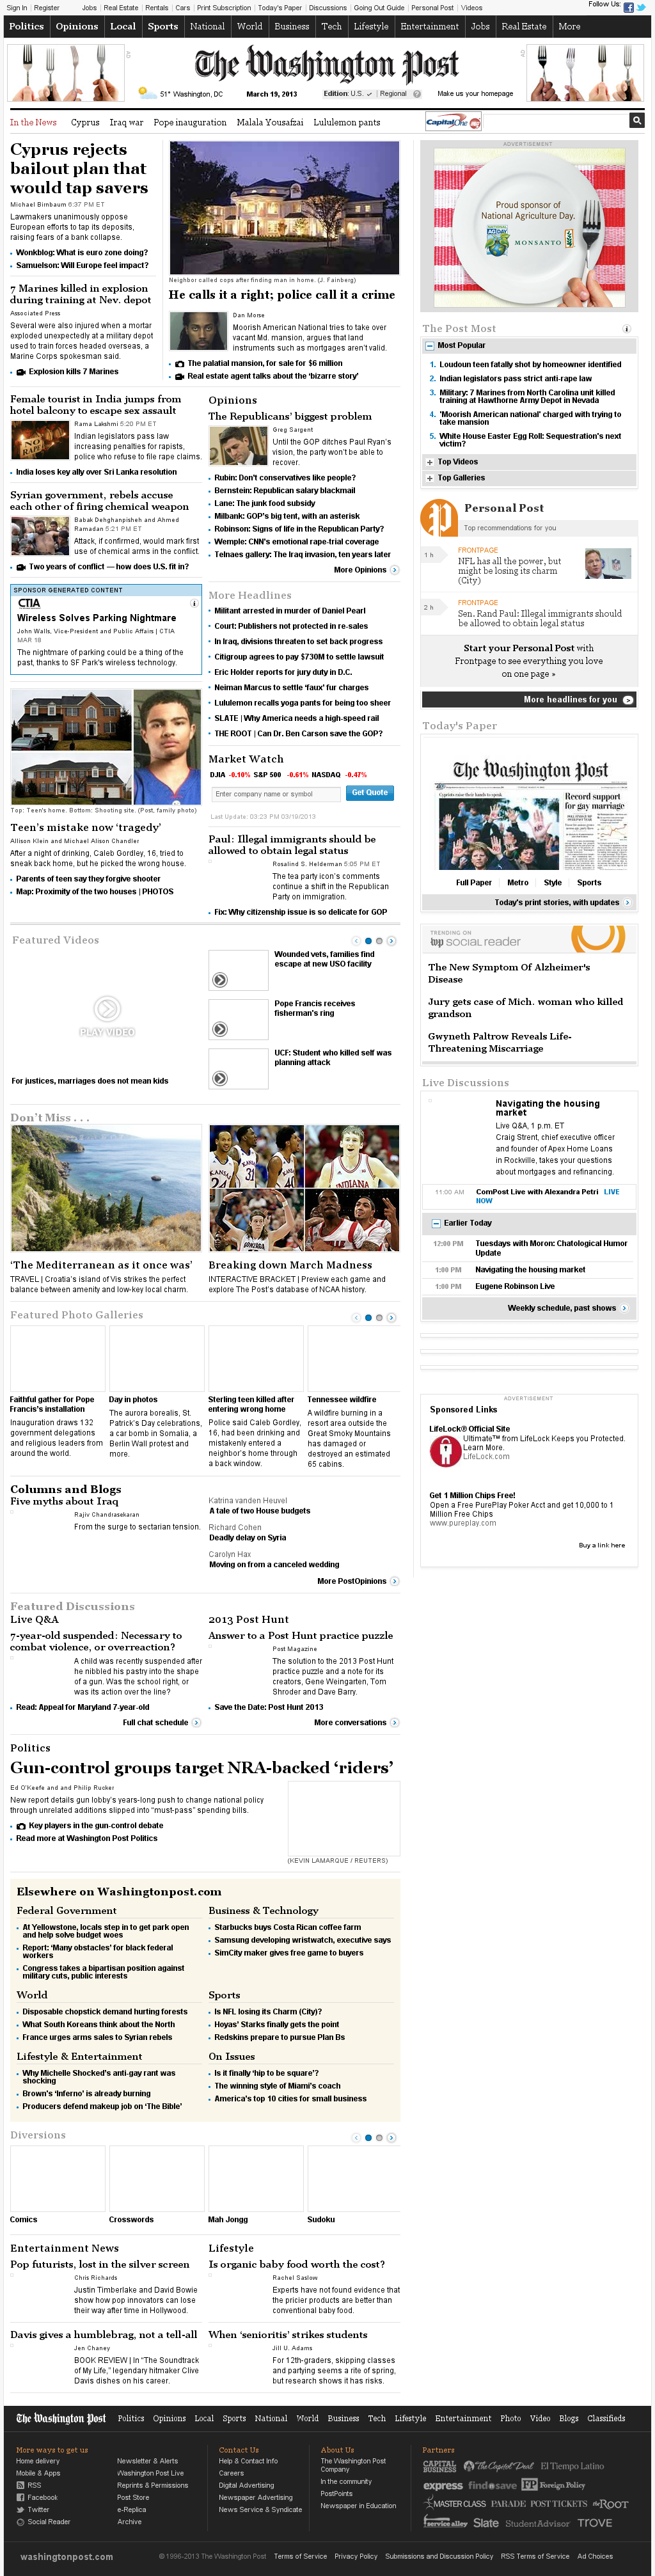 The Washington Post at Tuesday March 19, 2013, 7:29 p.m. UTC